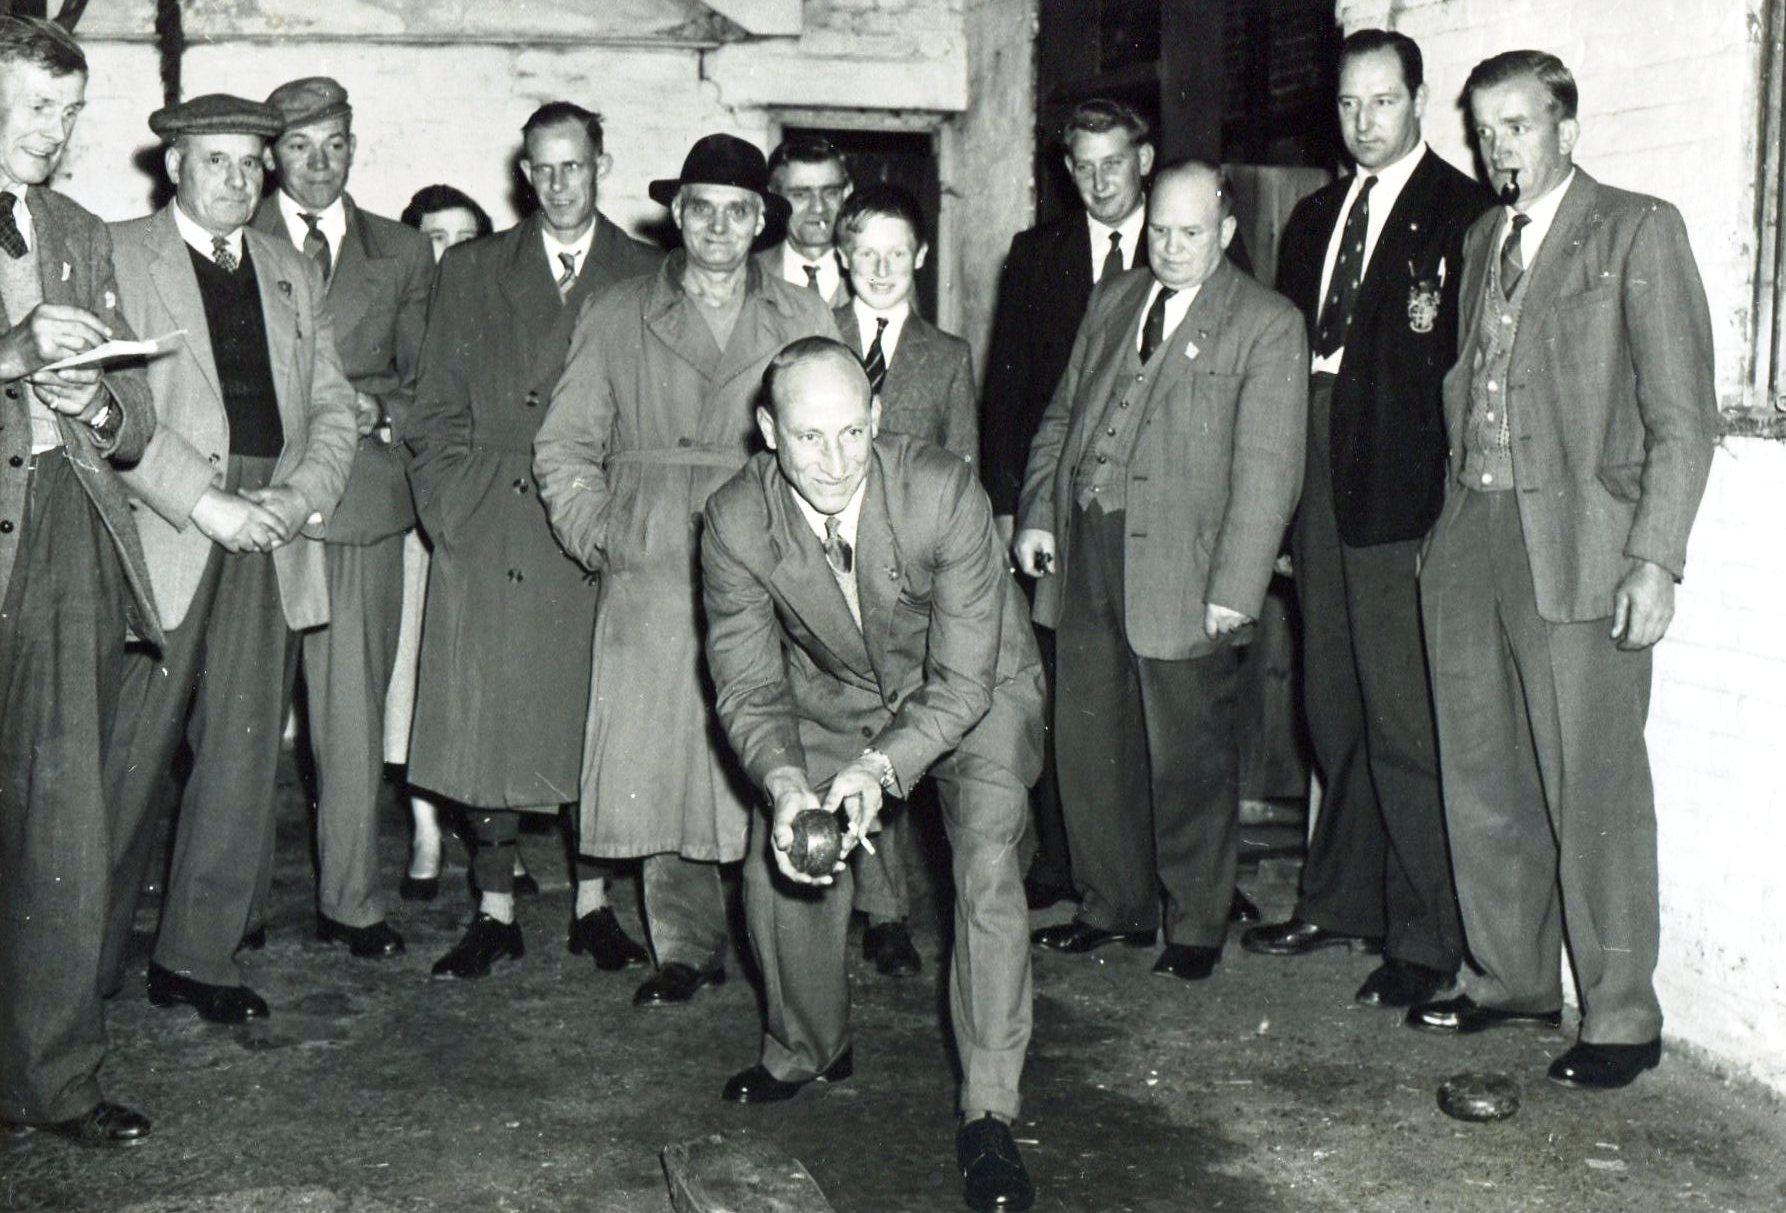 British Legion, 3 pin bowling at Railway Inn